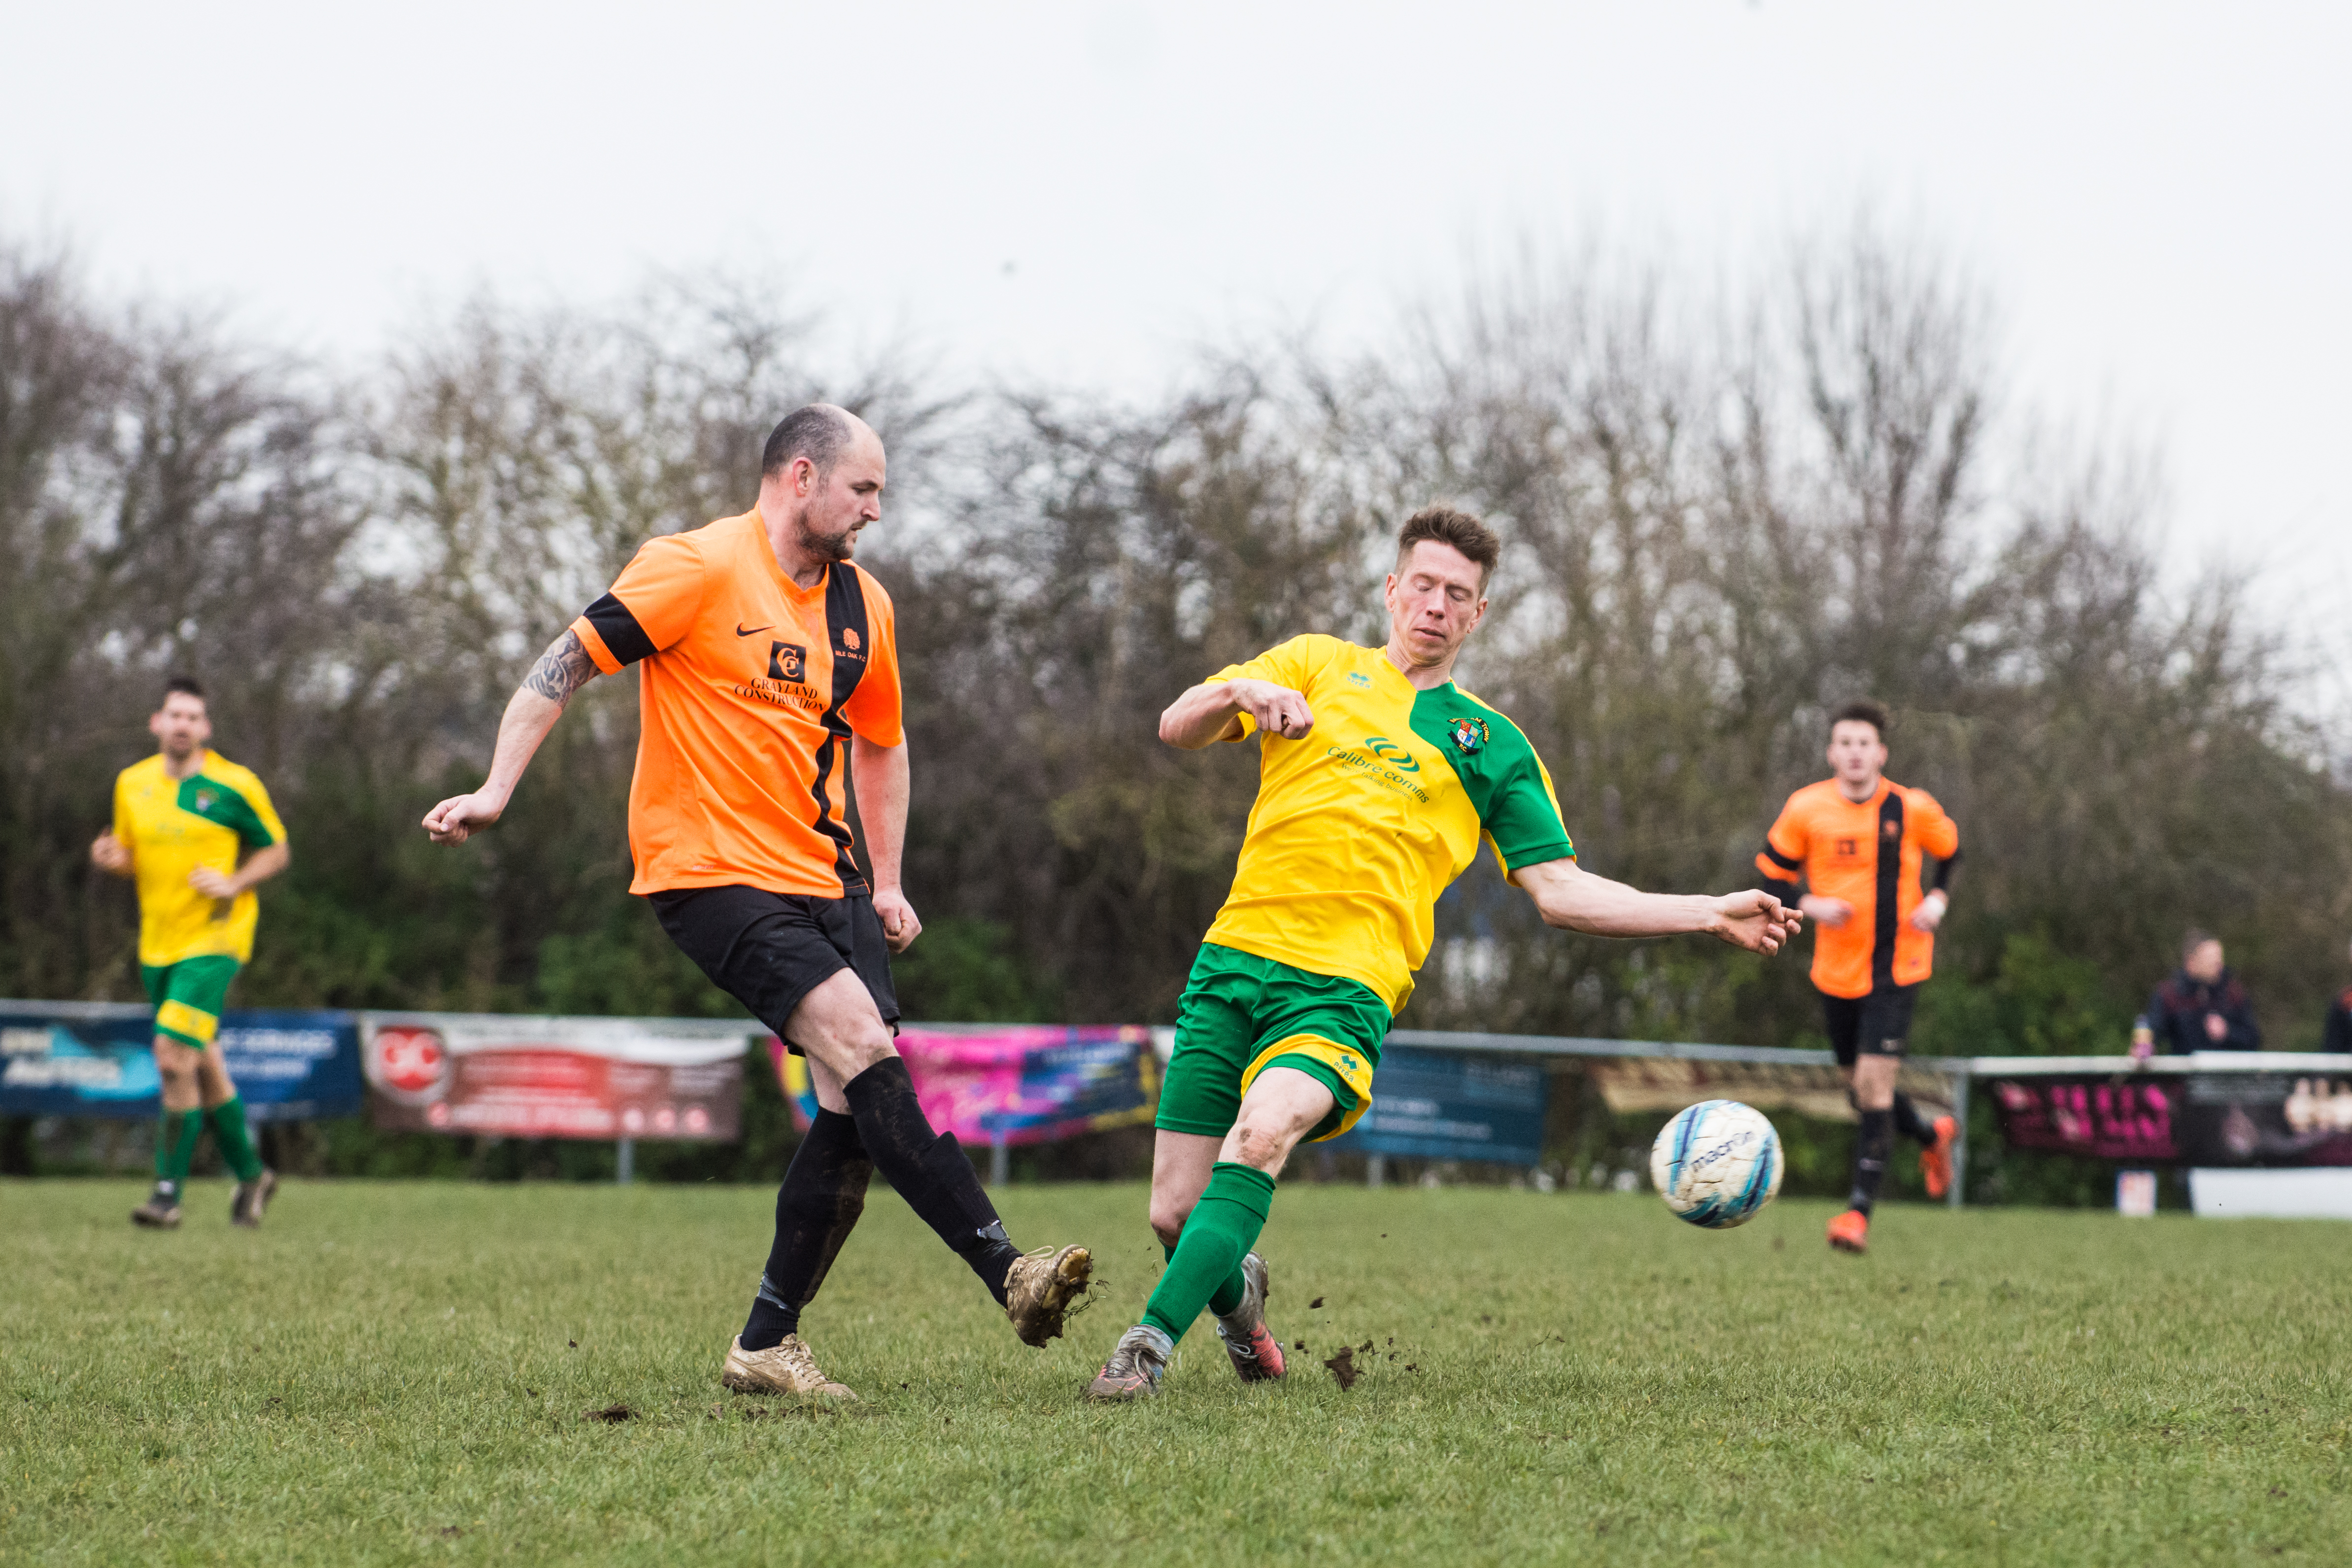 DAVID_JEFFERY Mile Oak FC vs Hailsham Town FC 24.03.18 48